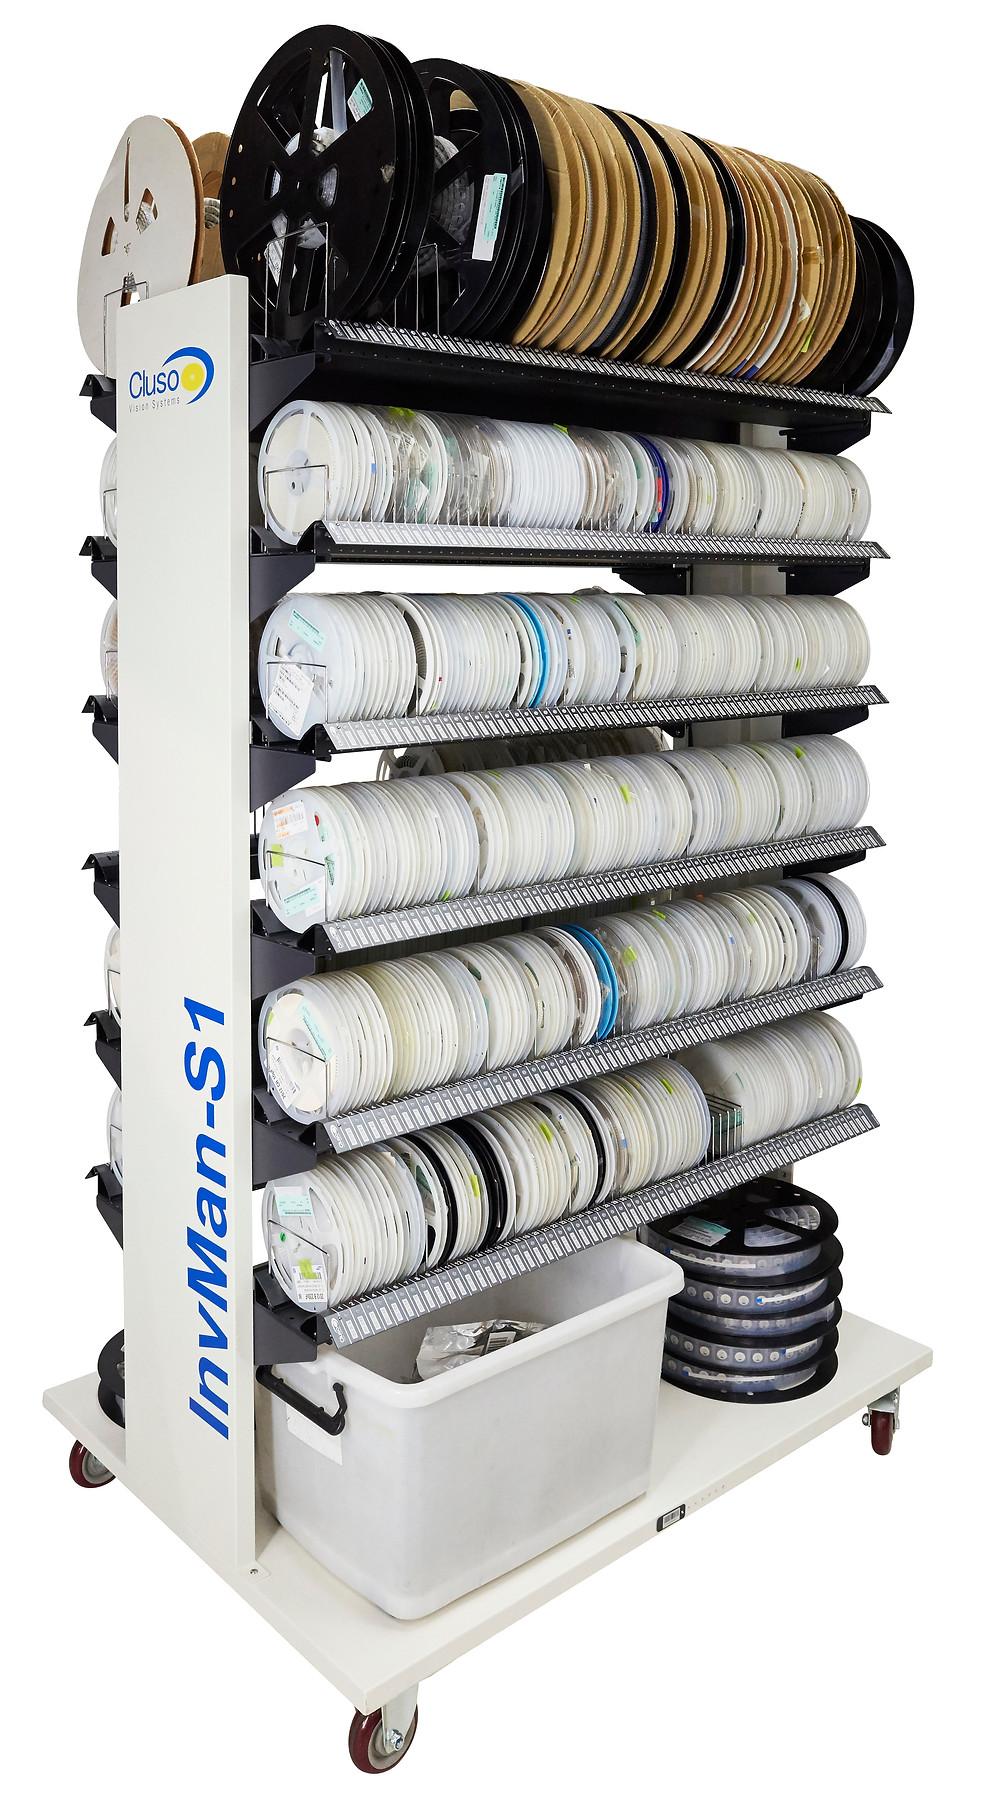 Smt inventory solution